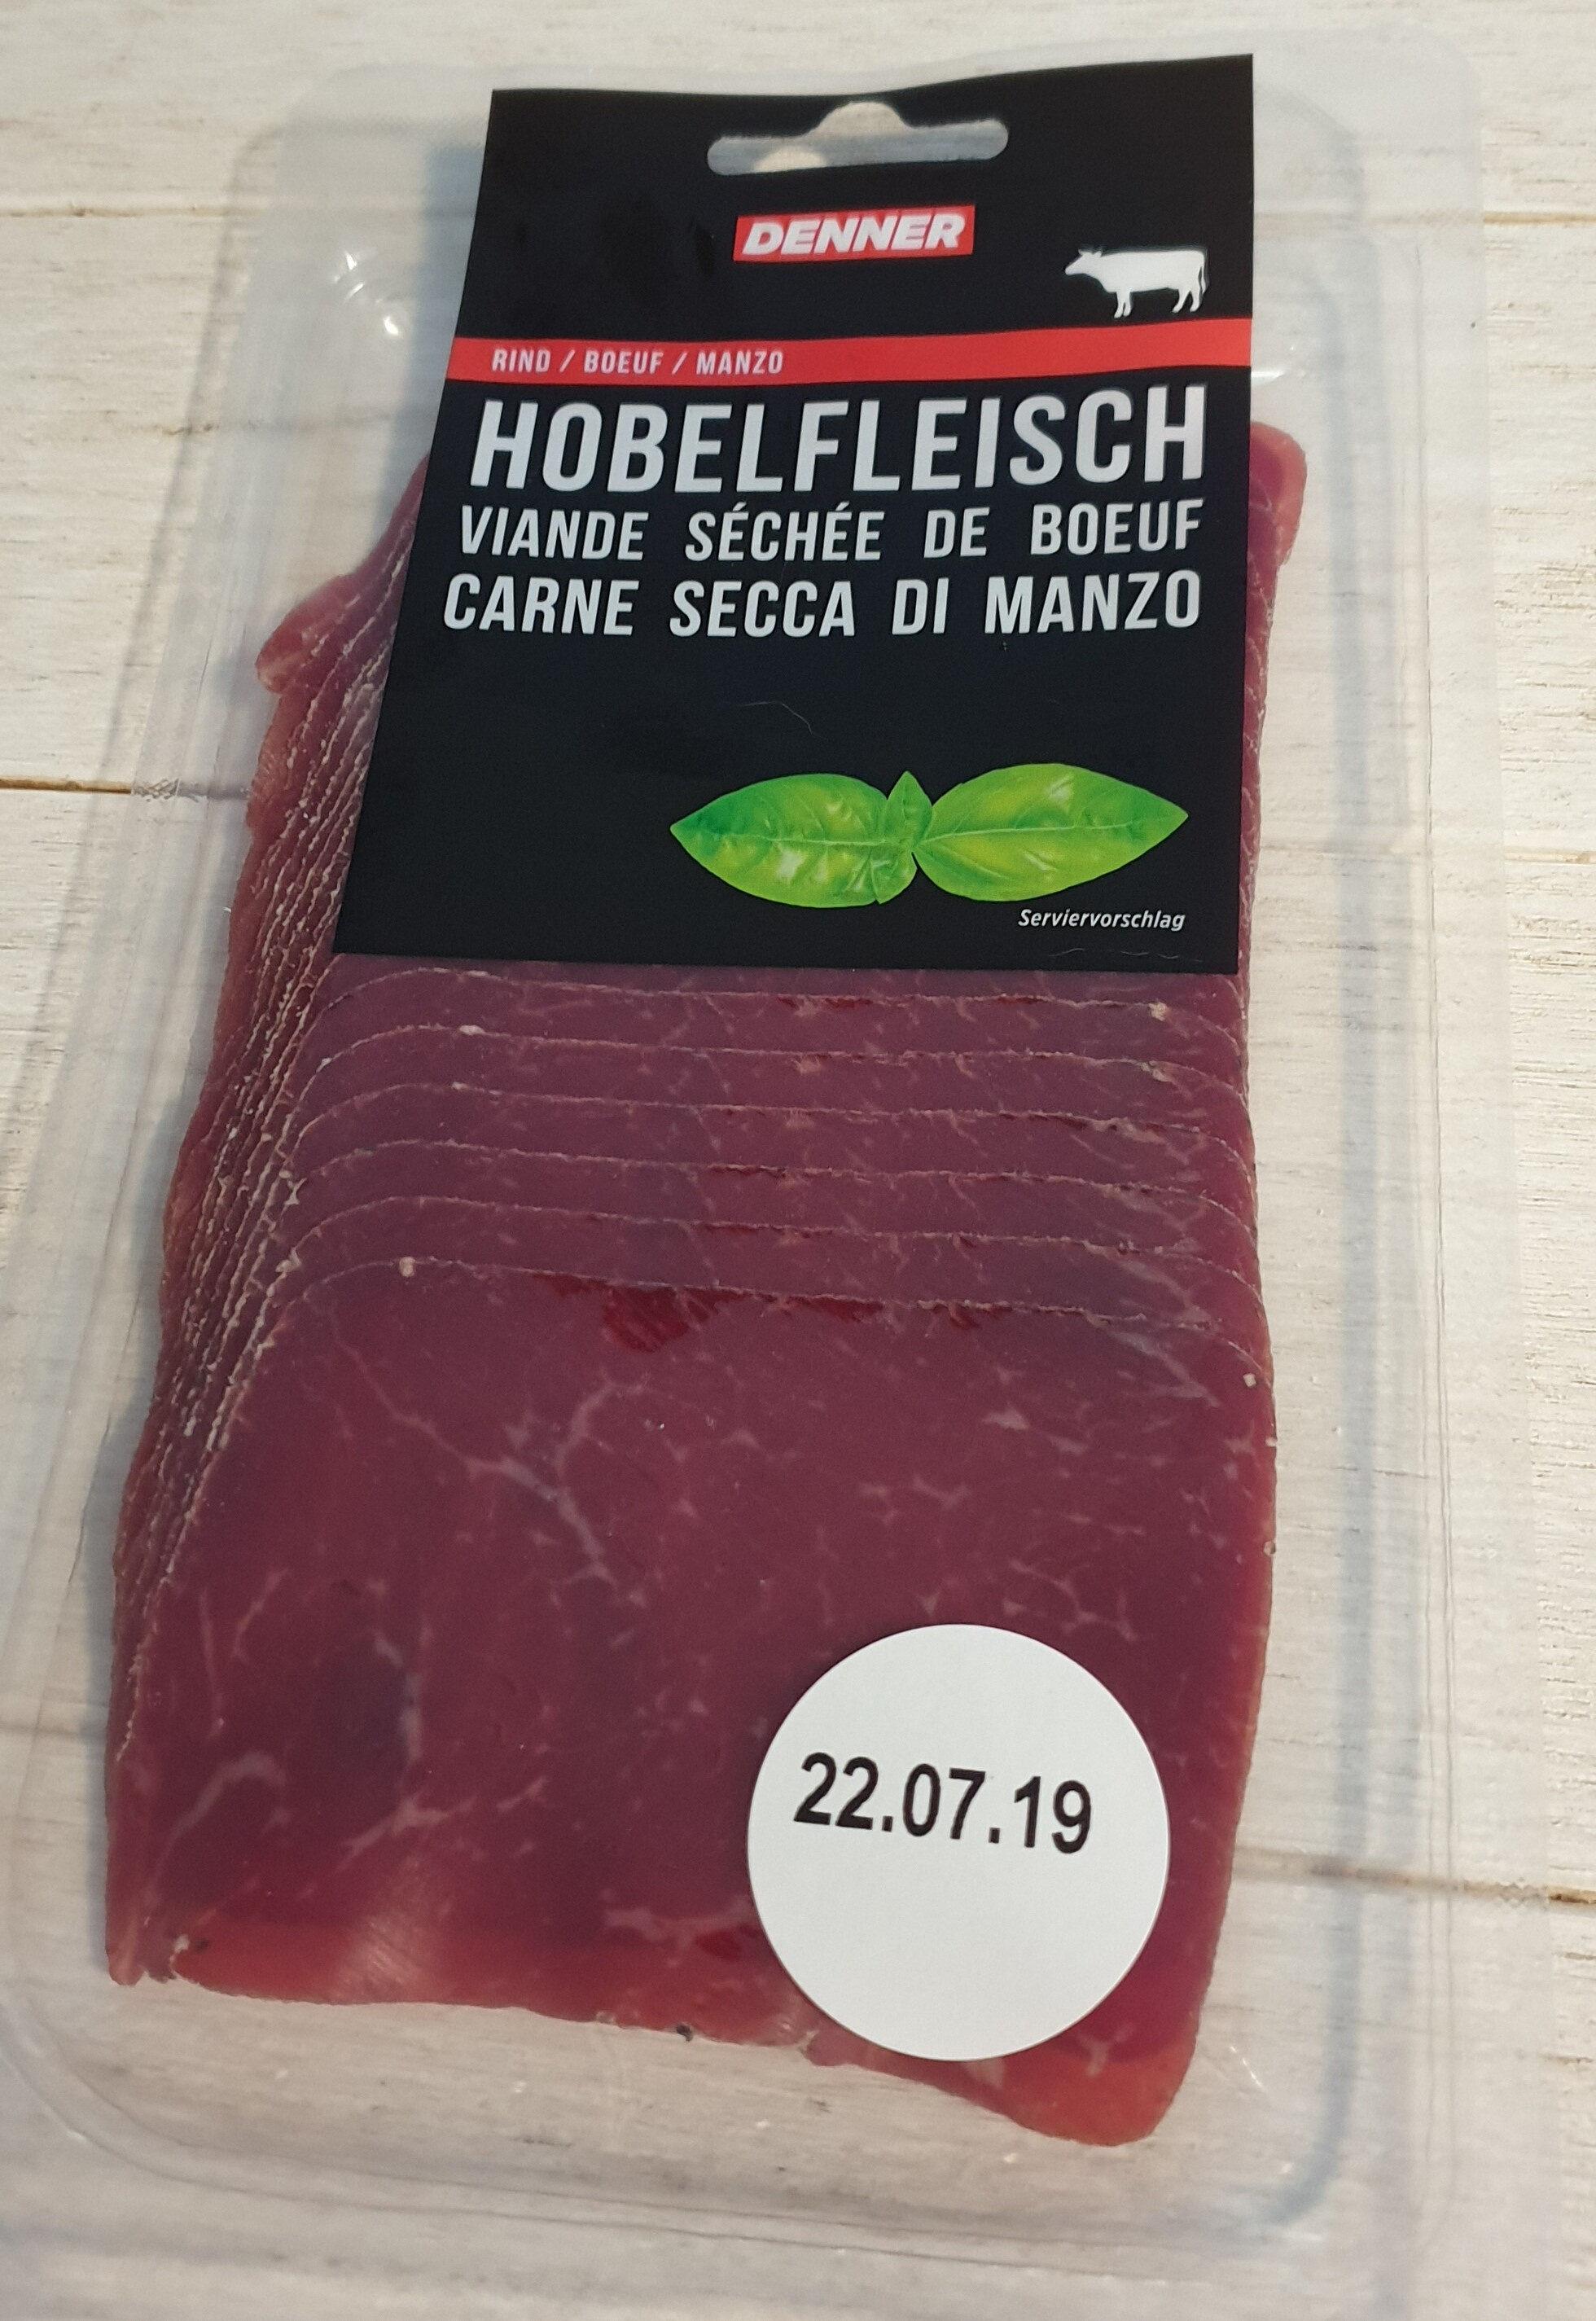 Viande séchée de boeuf - Product - fr